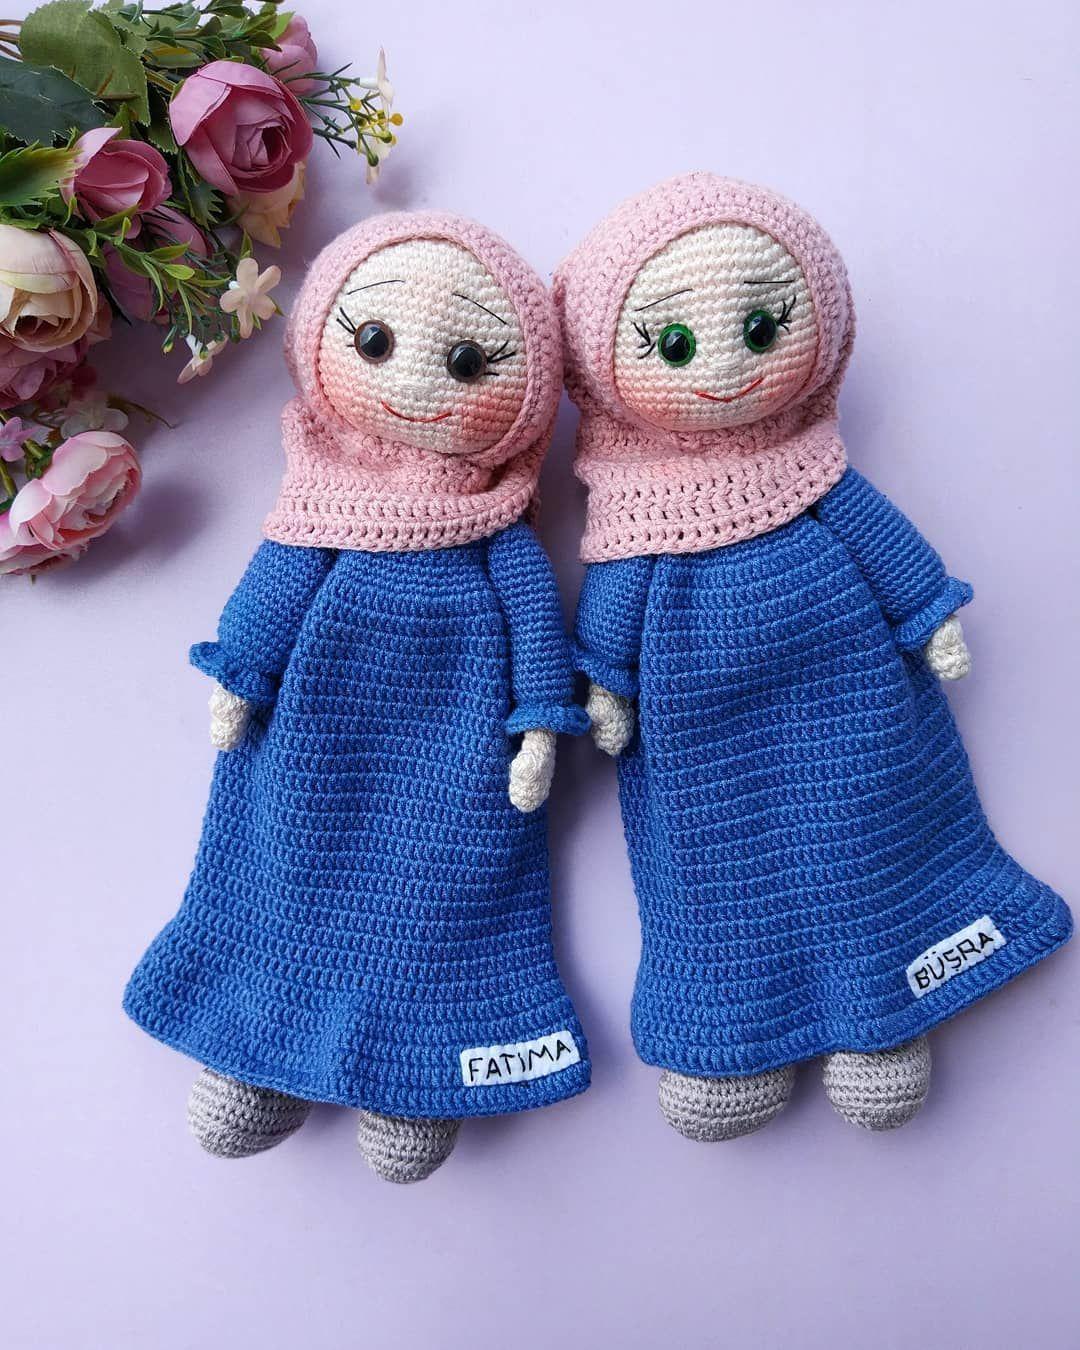 Free Easy Amigurumi Crochet Patterns Crochet Ideas Crochet Dolls